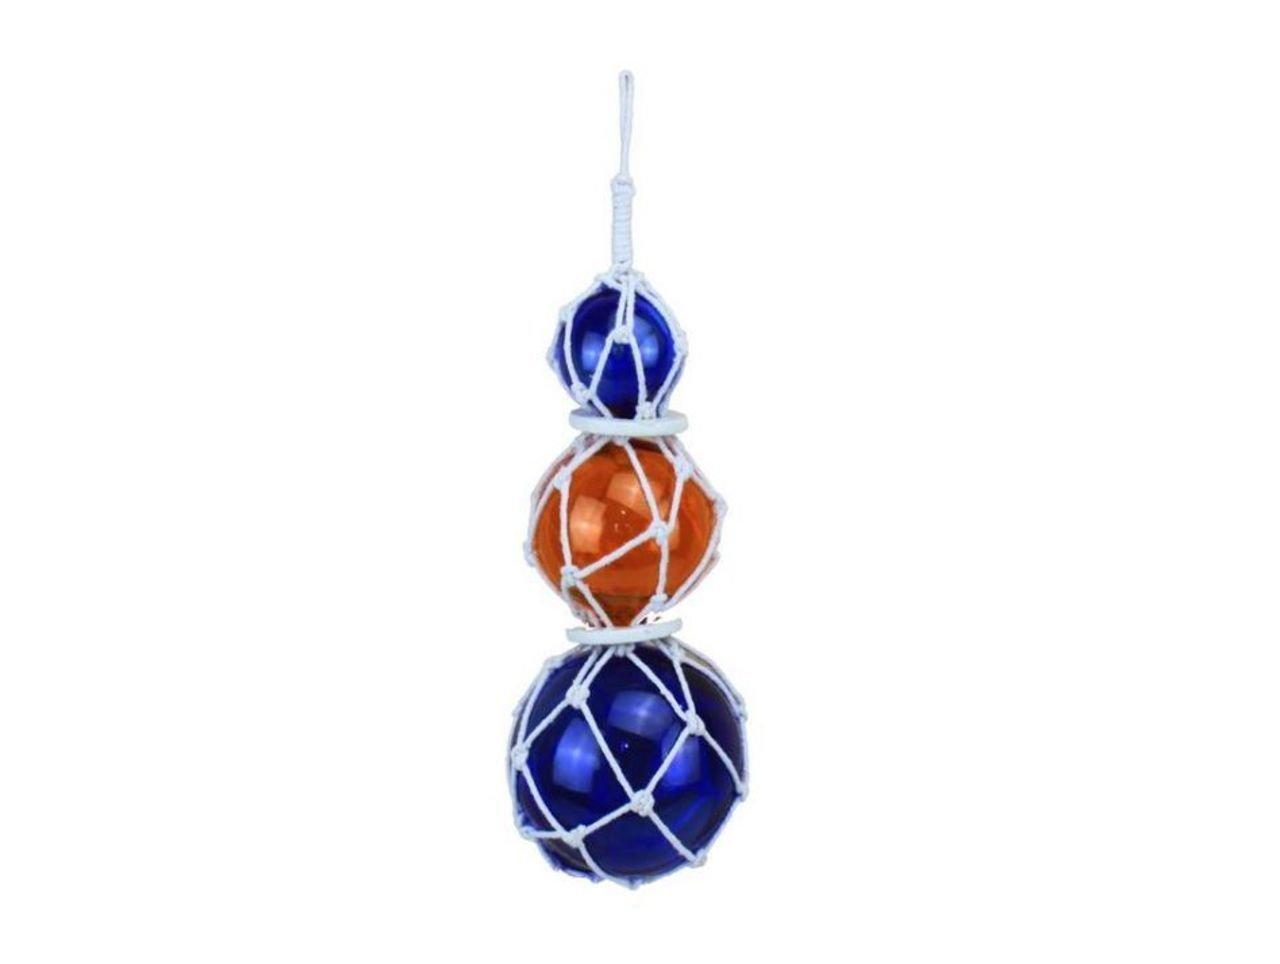 Hampton Nautical 3xglass-101 Orange-Blue Japanese Ball Fishing Floats with White Netting Decoration 11-Glass Buoy